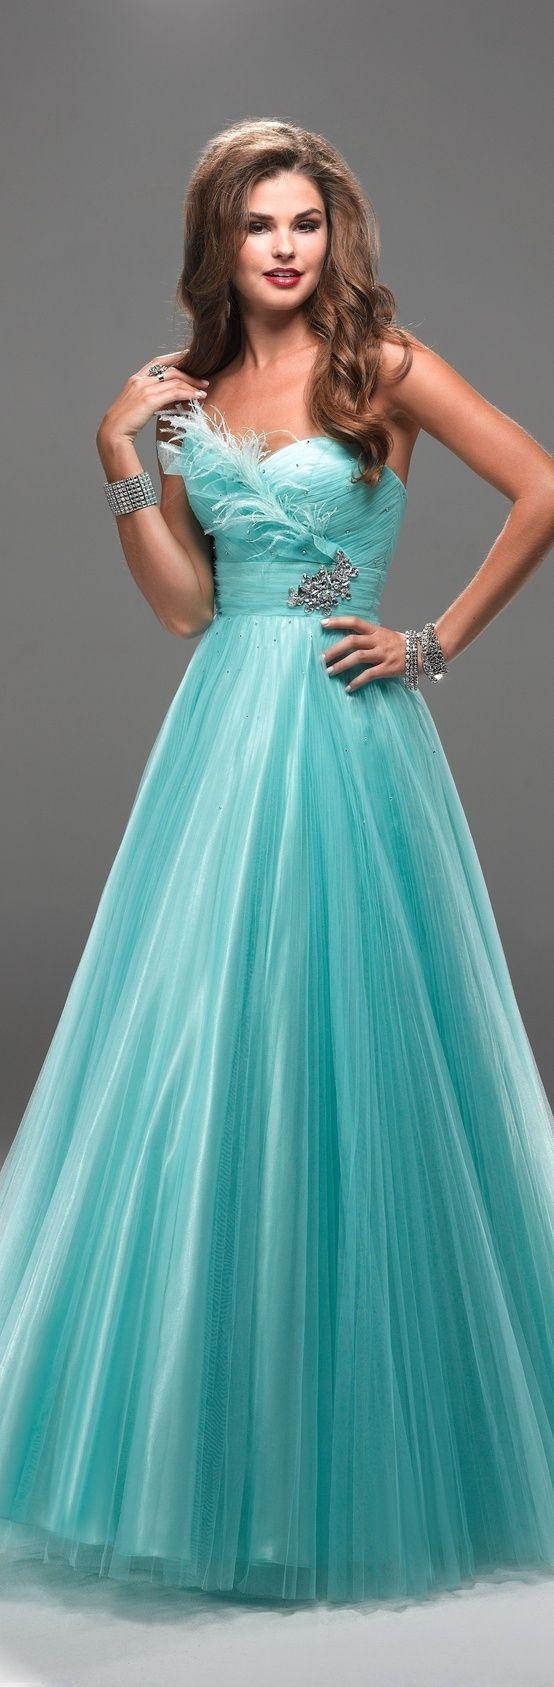 best fashion evening dressesspecial dresses promm